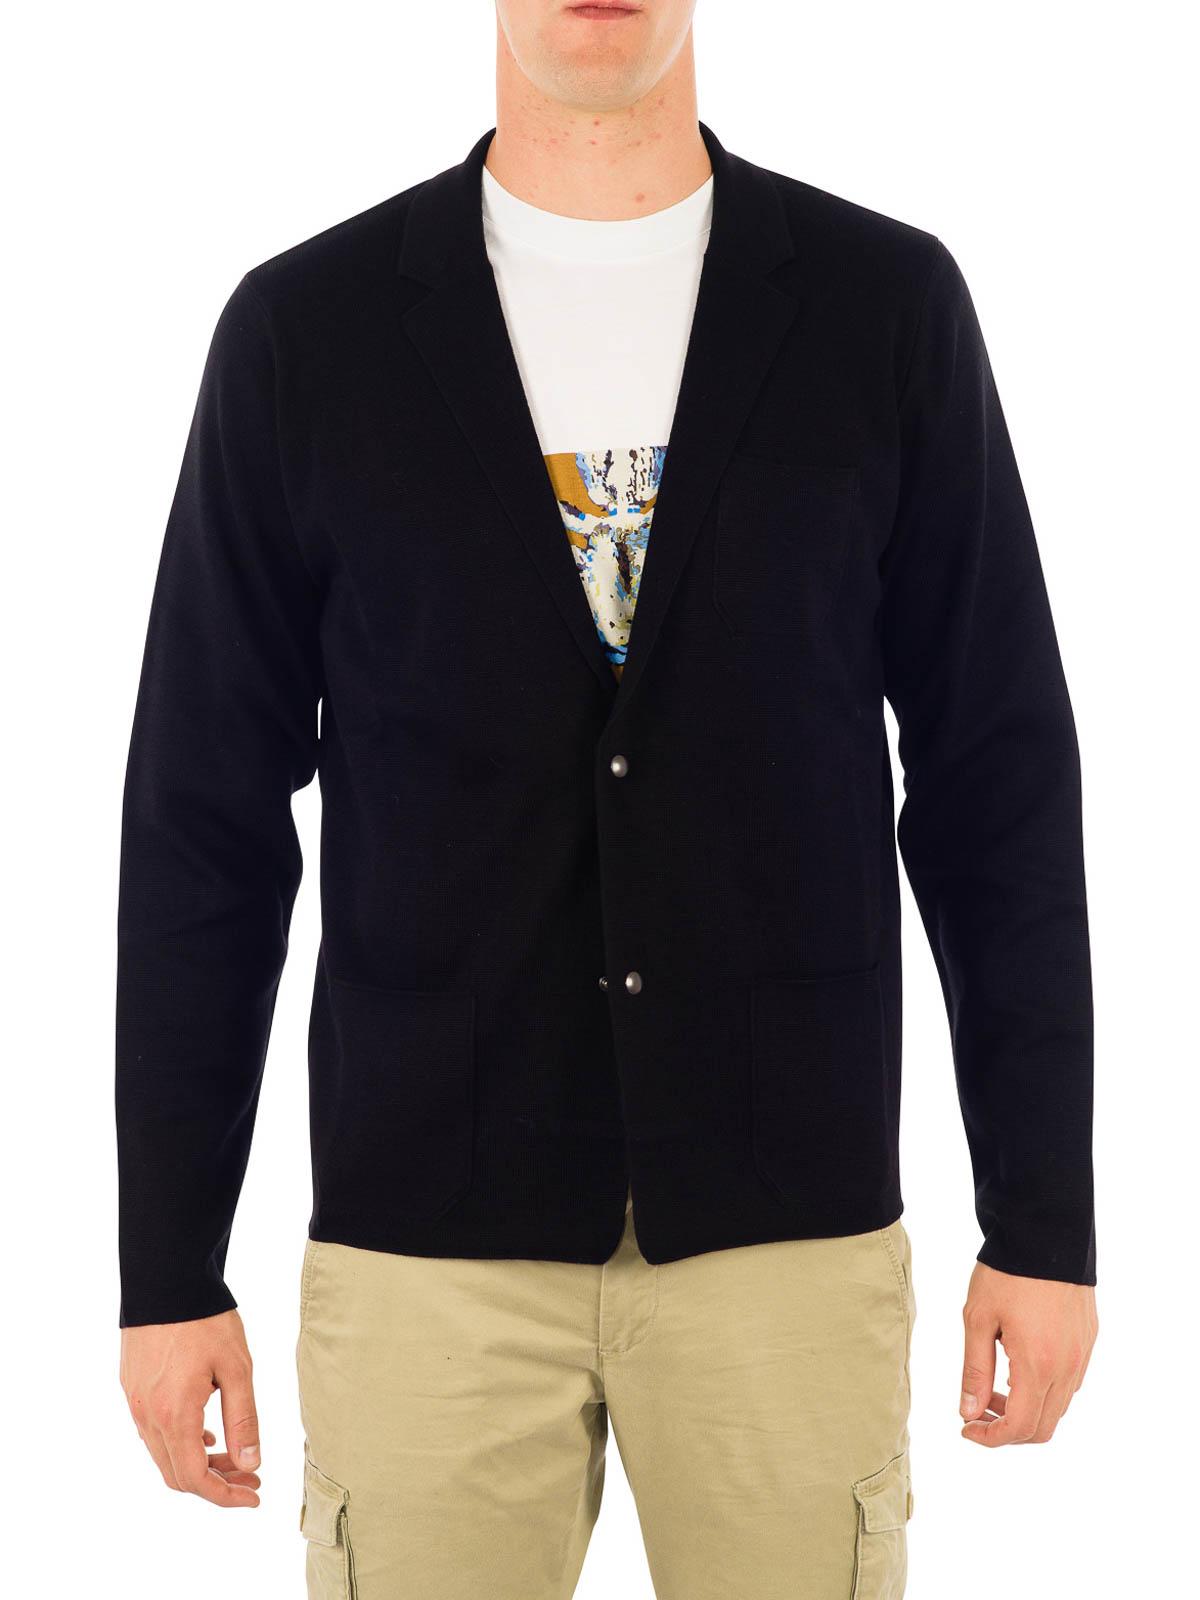 Blazer-inspired wool cardigan by Lanvin - cardigans | iKRIX